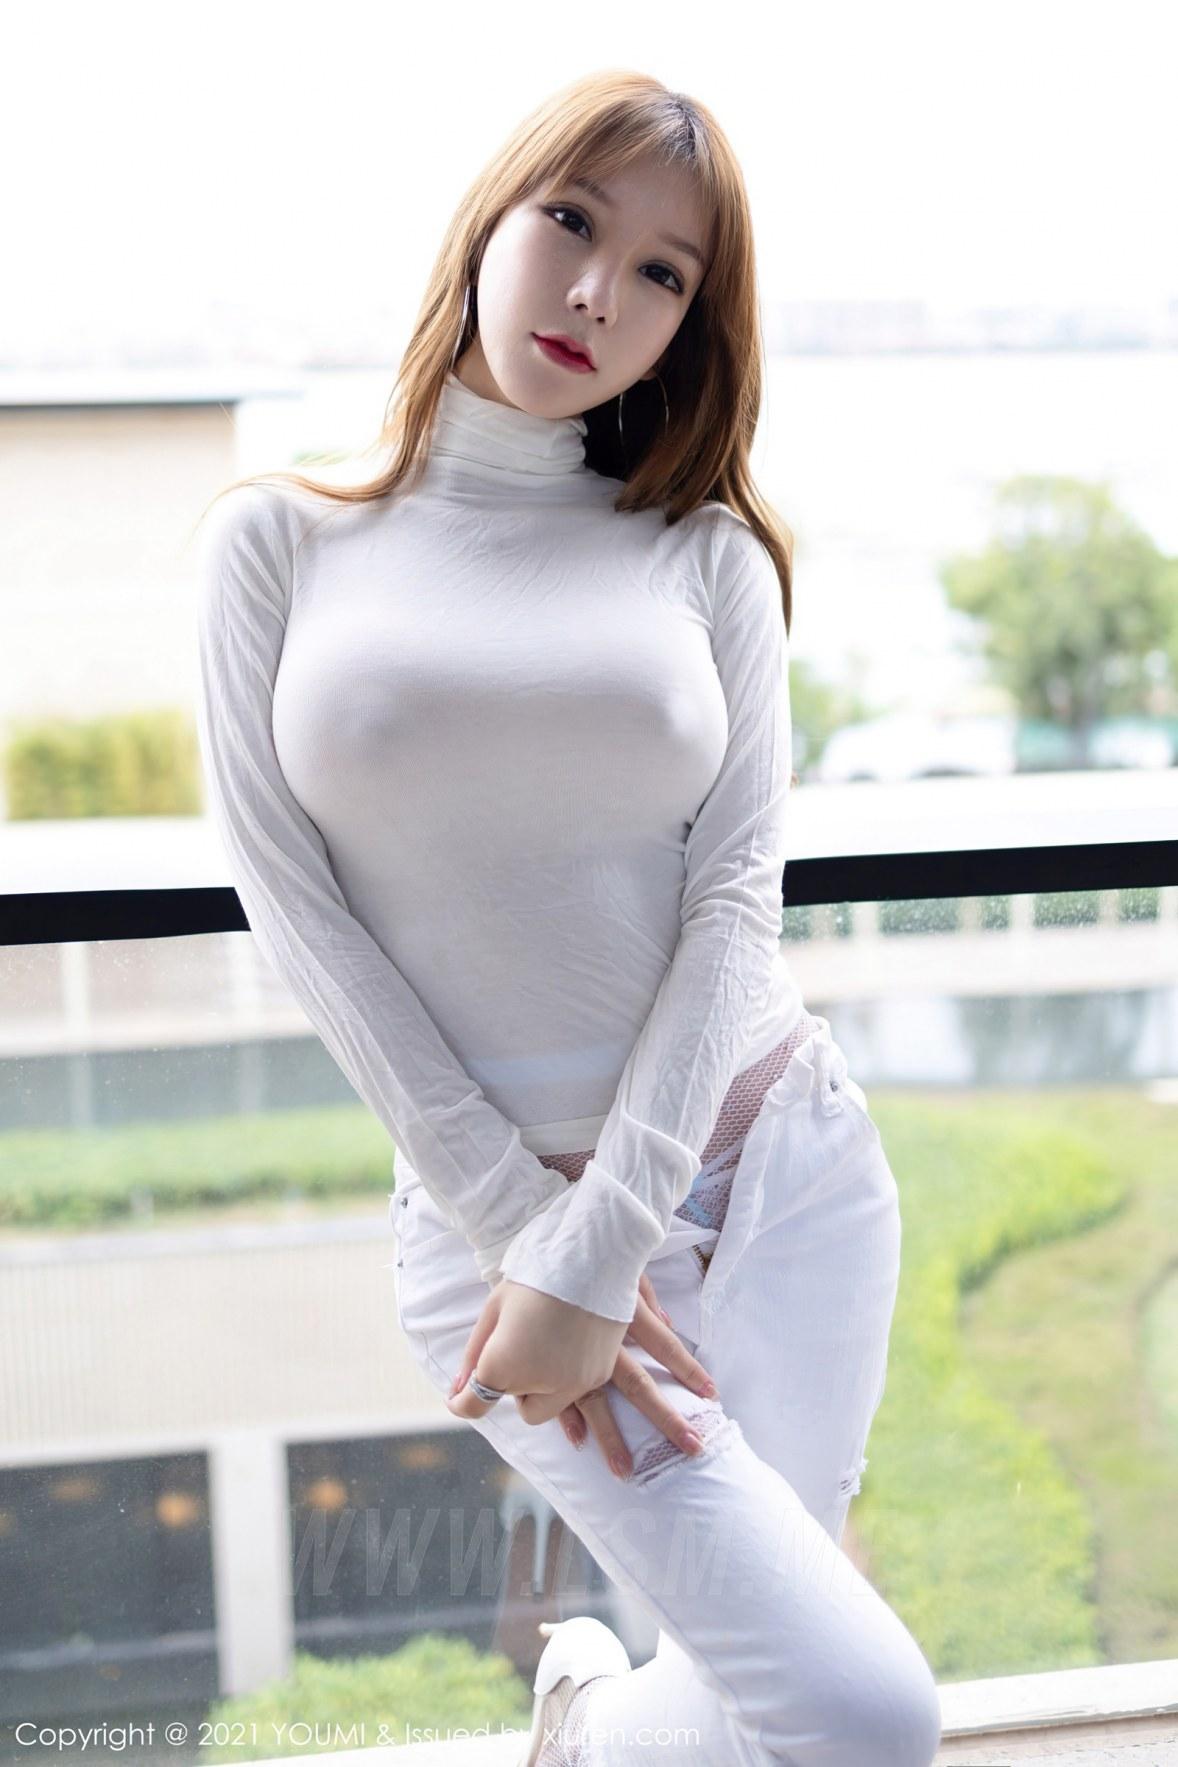 YOUMI 尤蜜荟 Vol.589 真空毛衣魅惑网袜 周于希 - 3